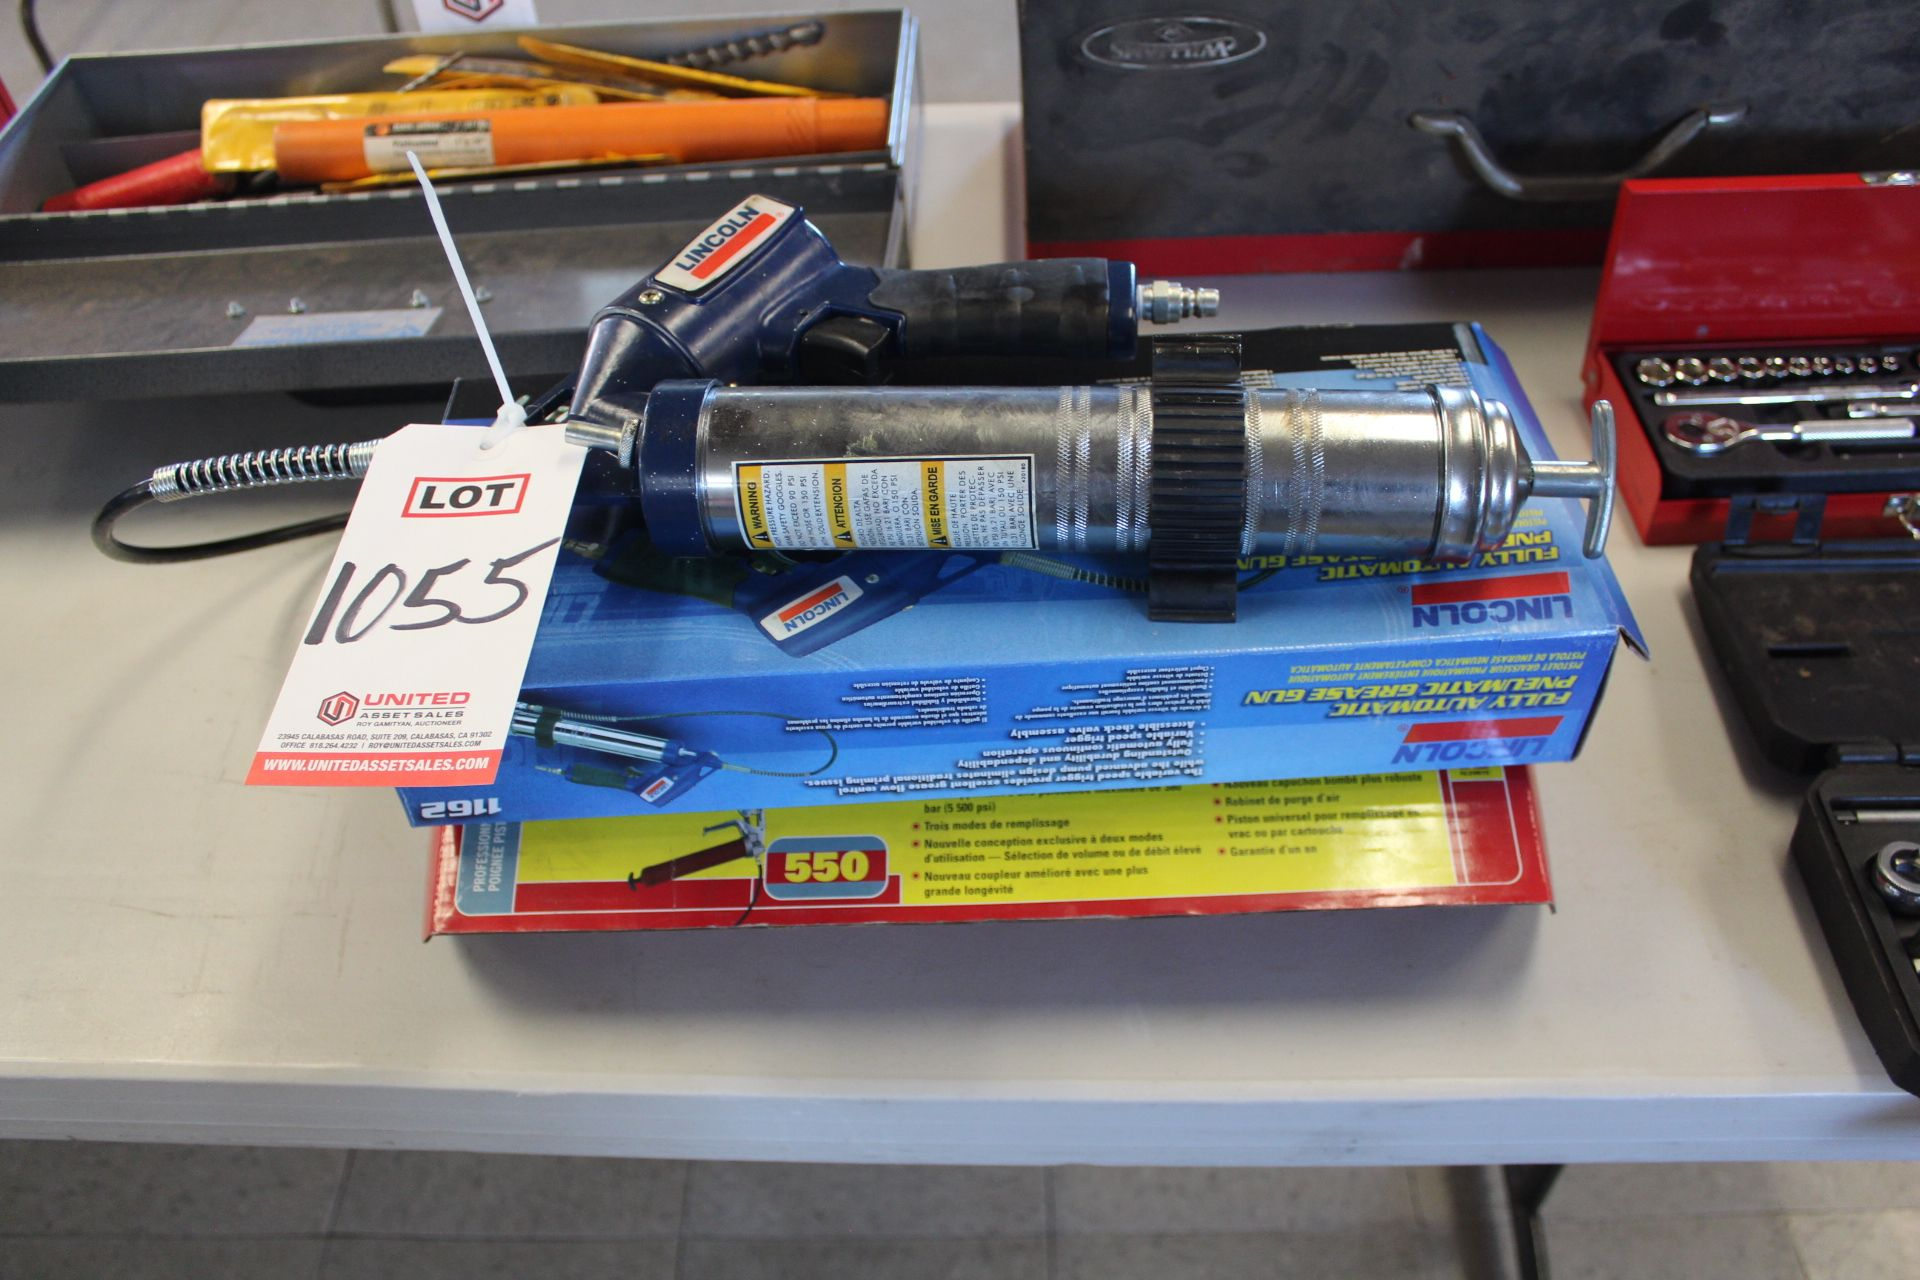 Lot 1055 - GLOT - REASE GUNS - NEW, (LUNCHROOM)